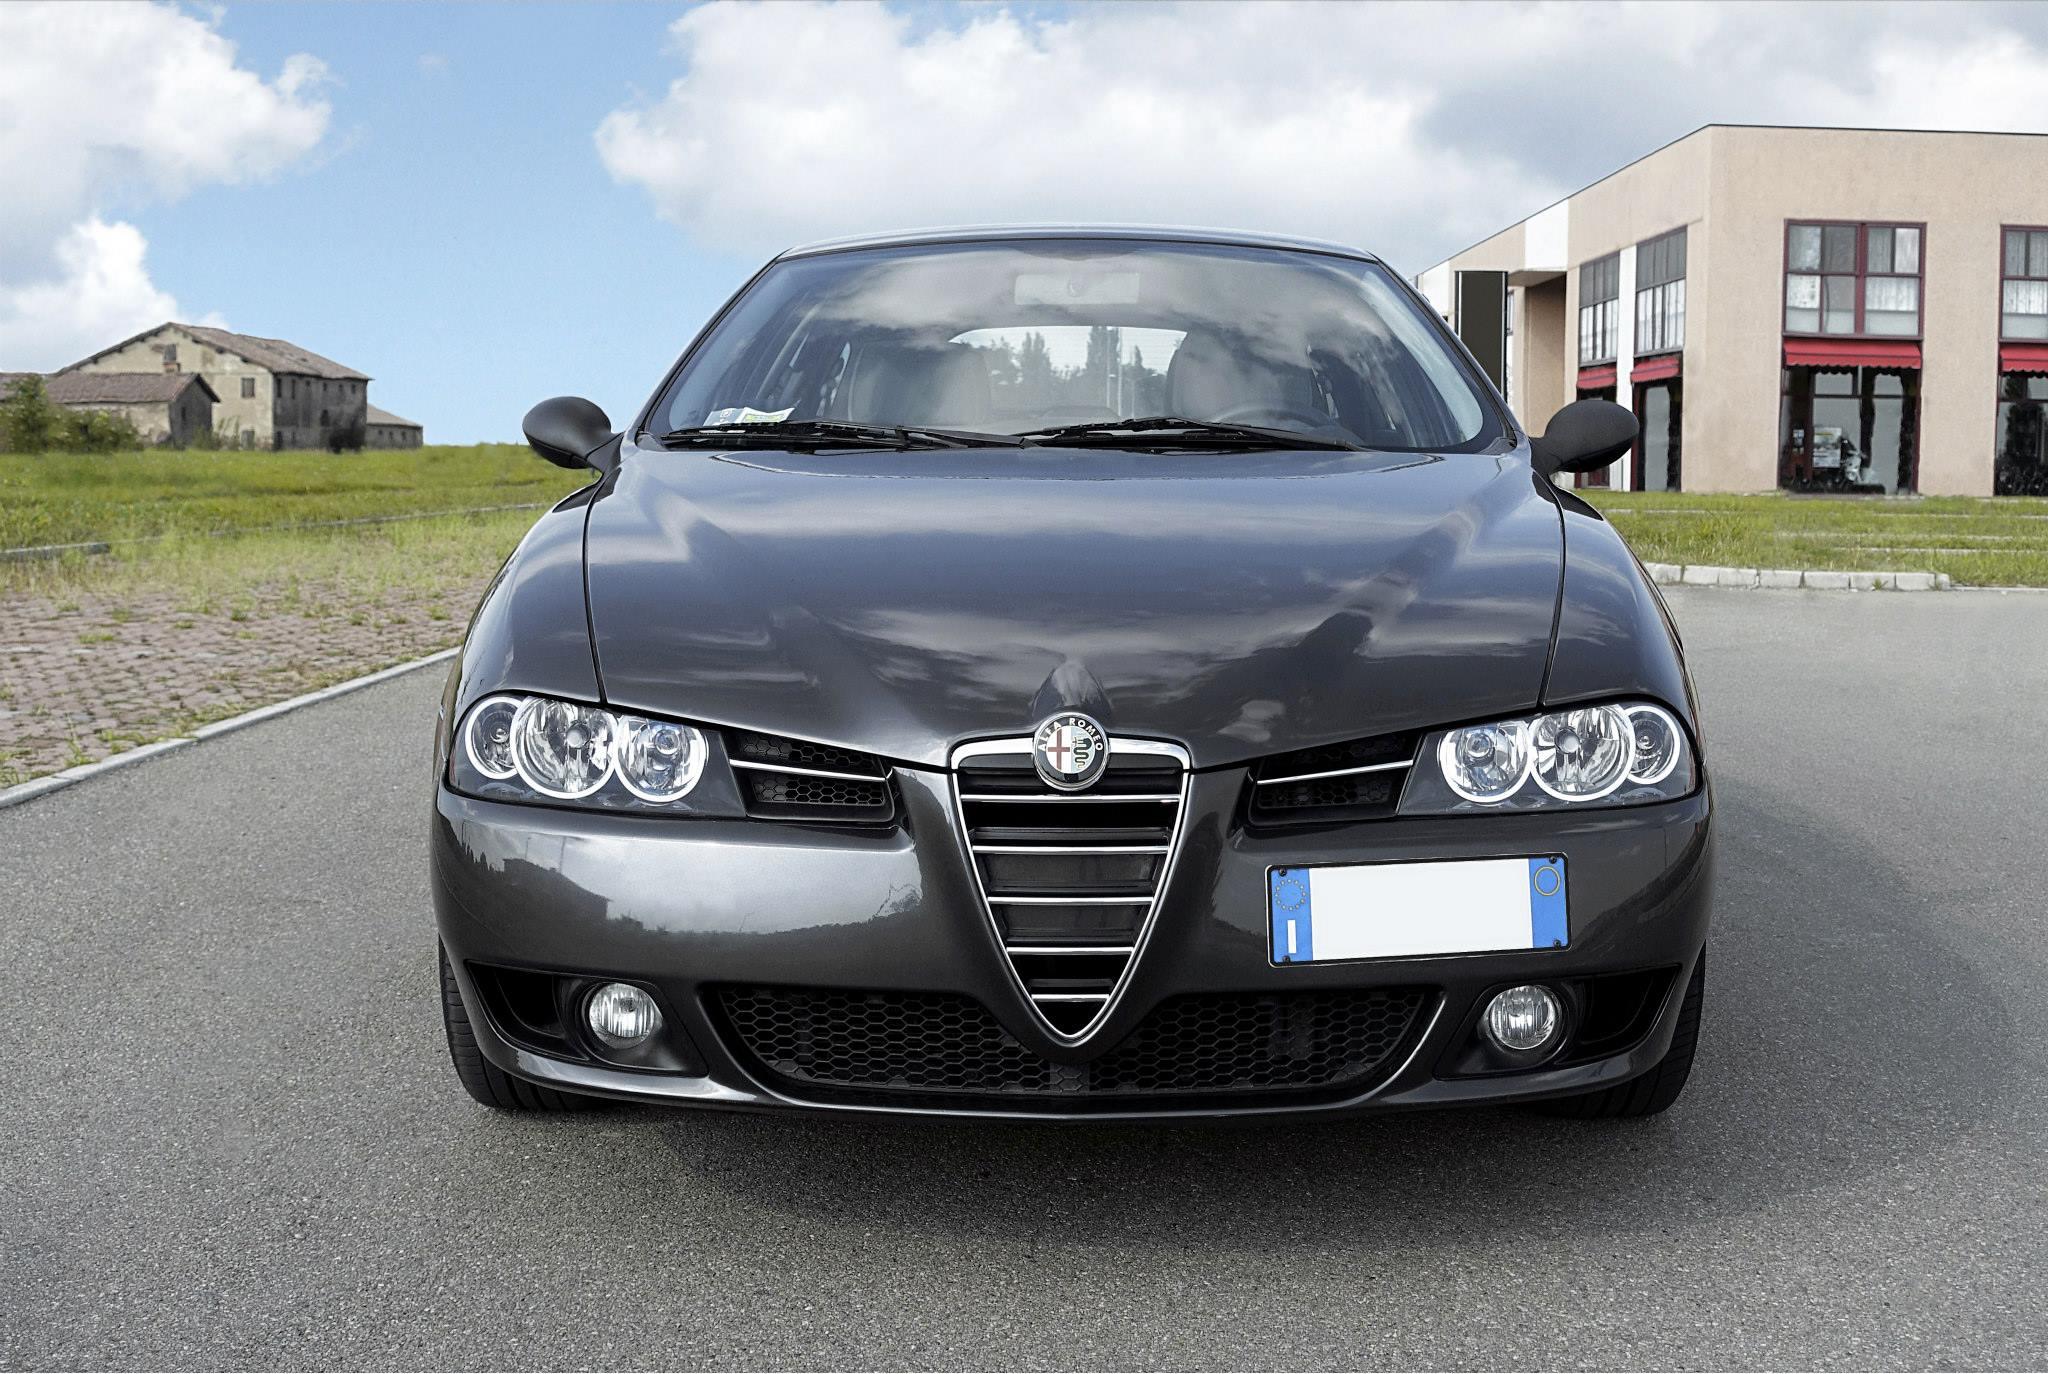 Alfa romeo cars wiki 12